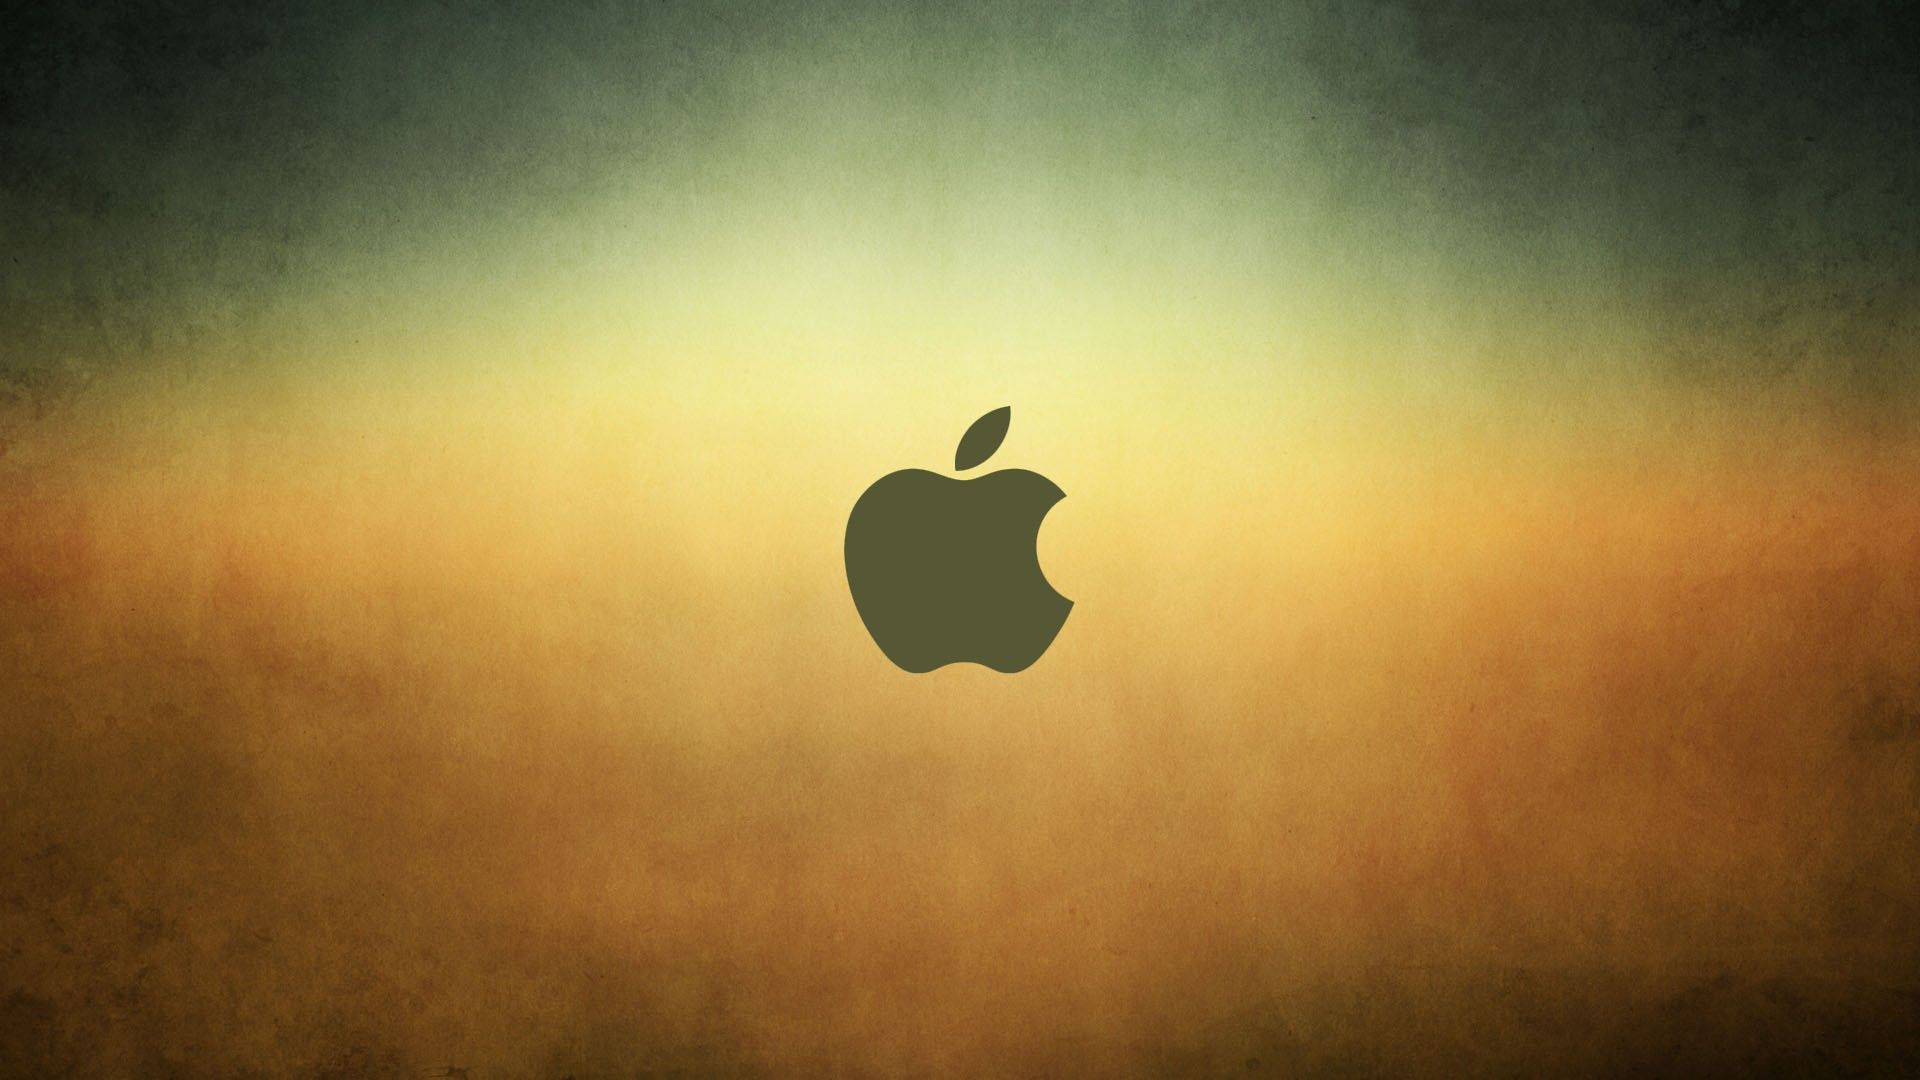 Background Iphone Apple